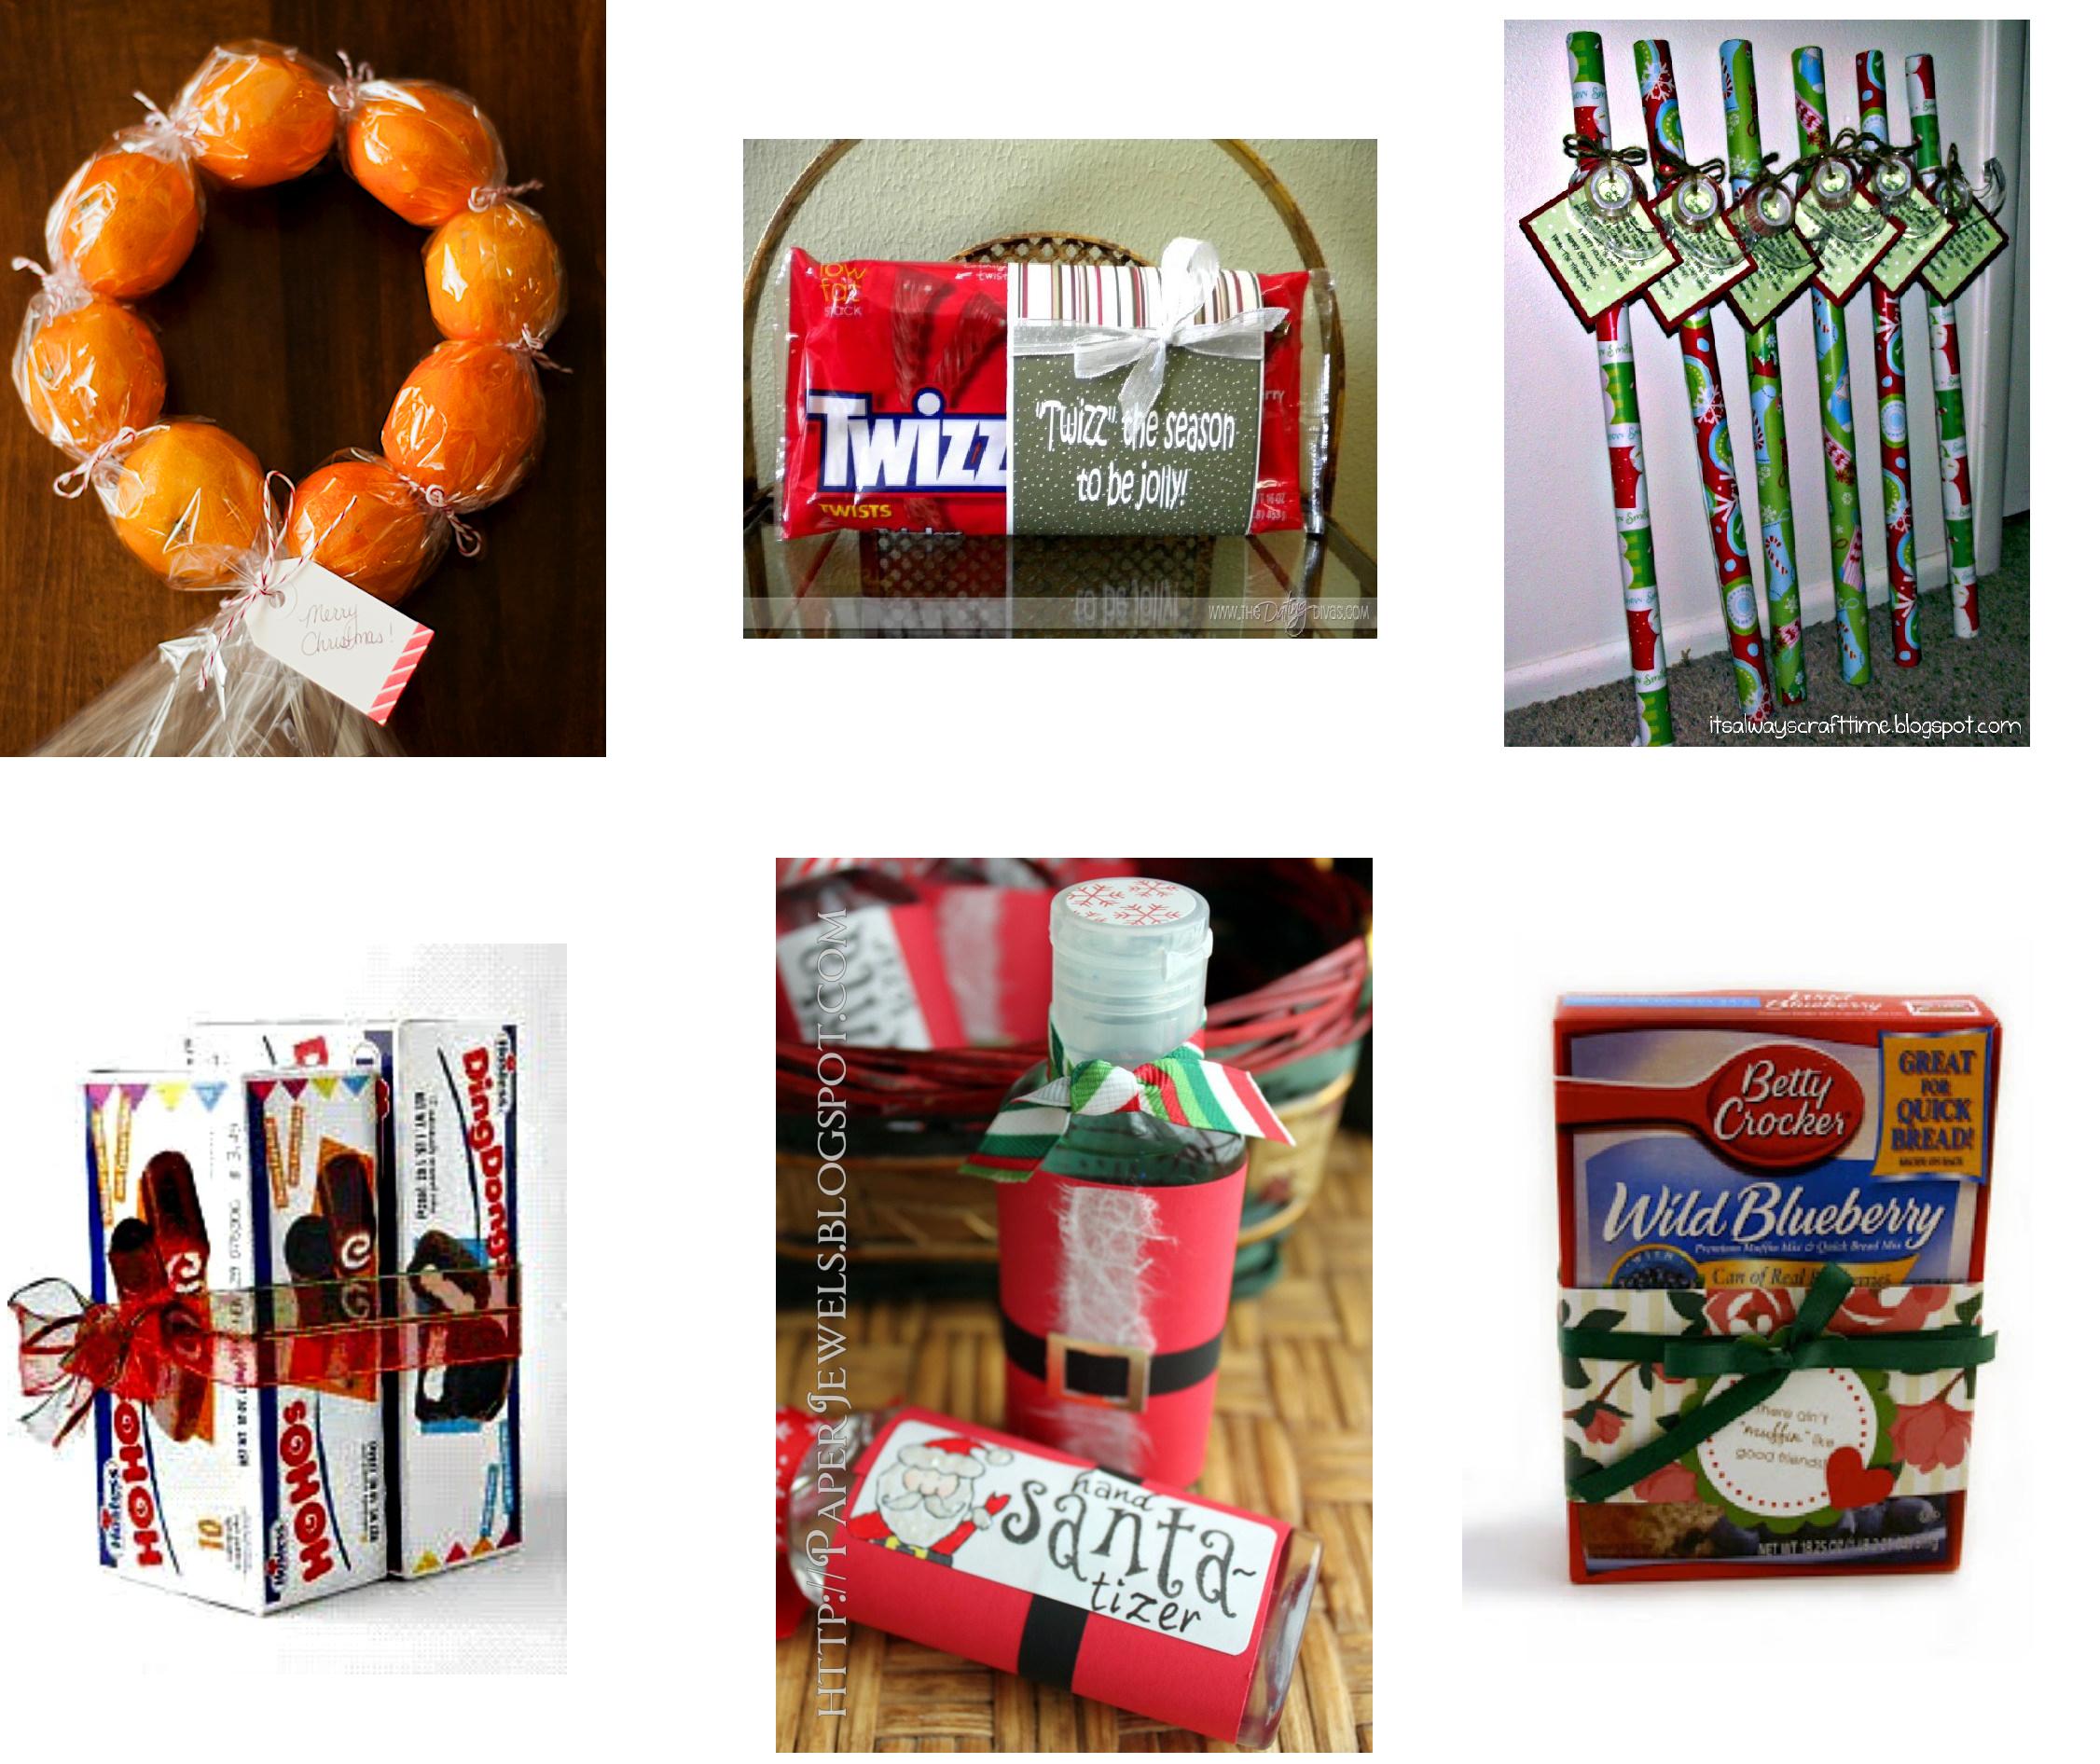 Neighbor christmas gifts blogspot